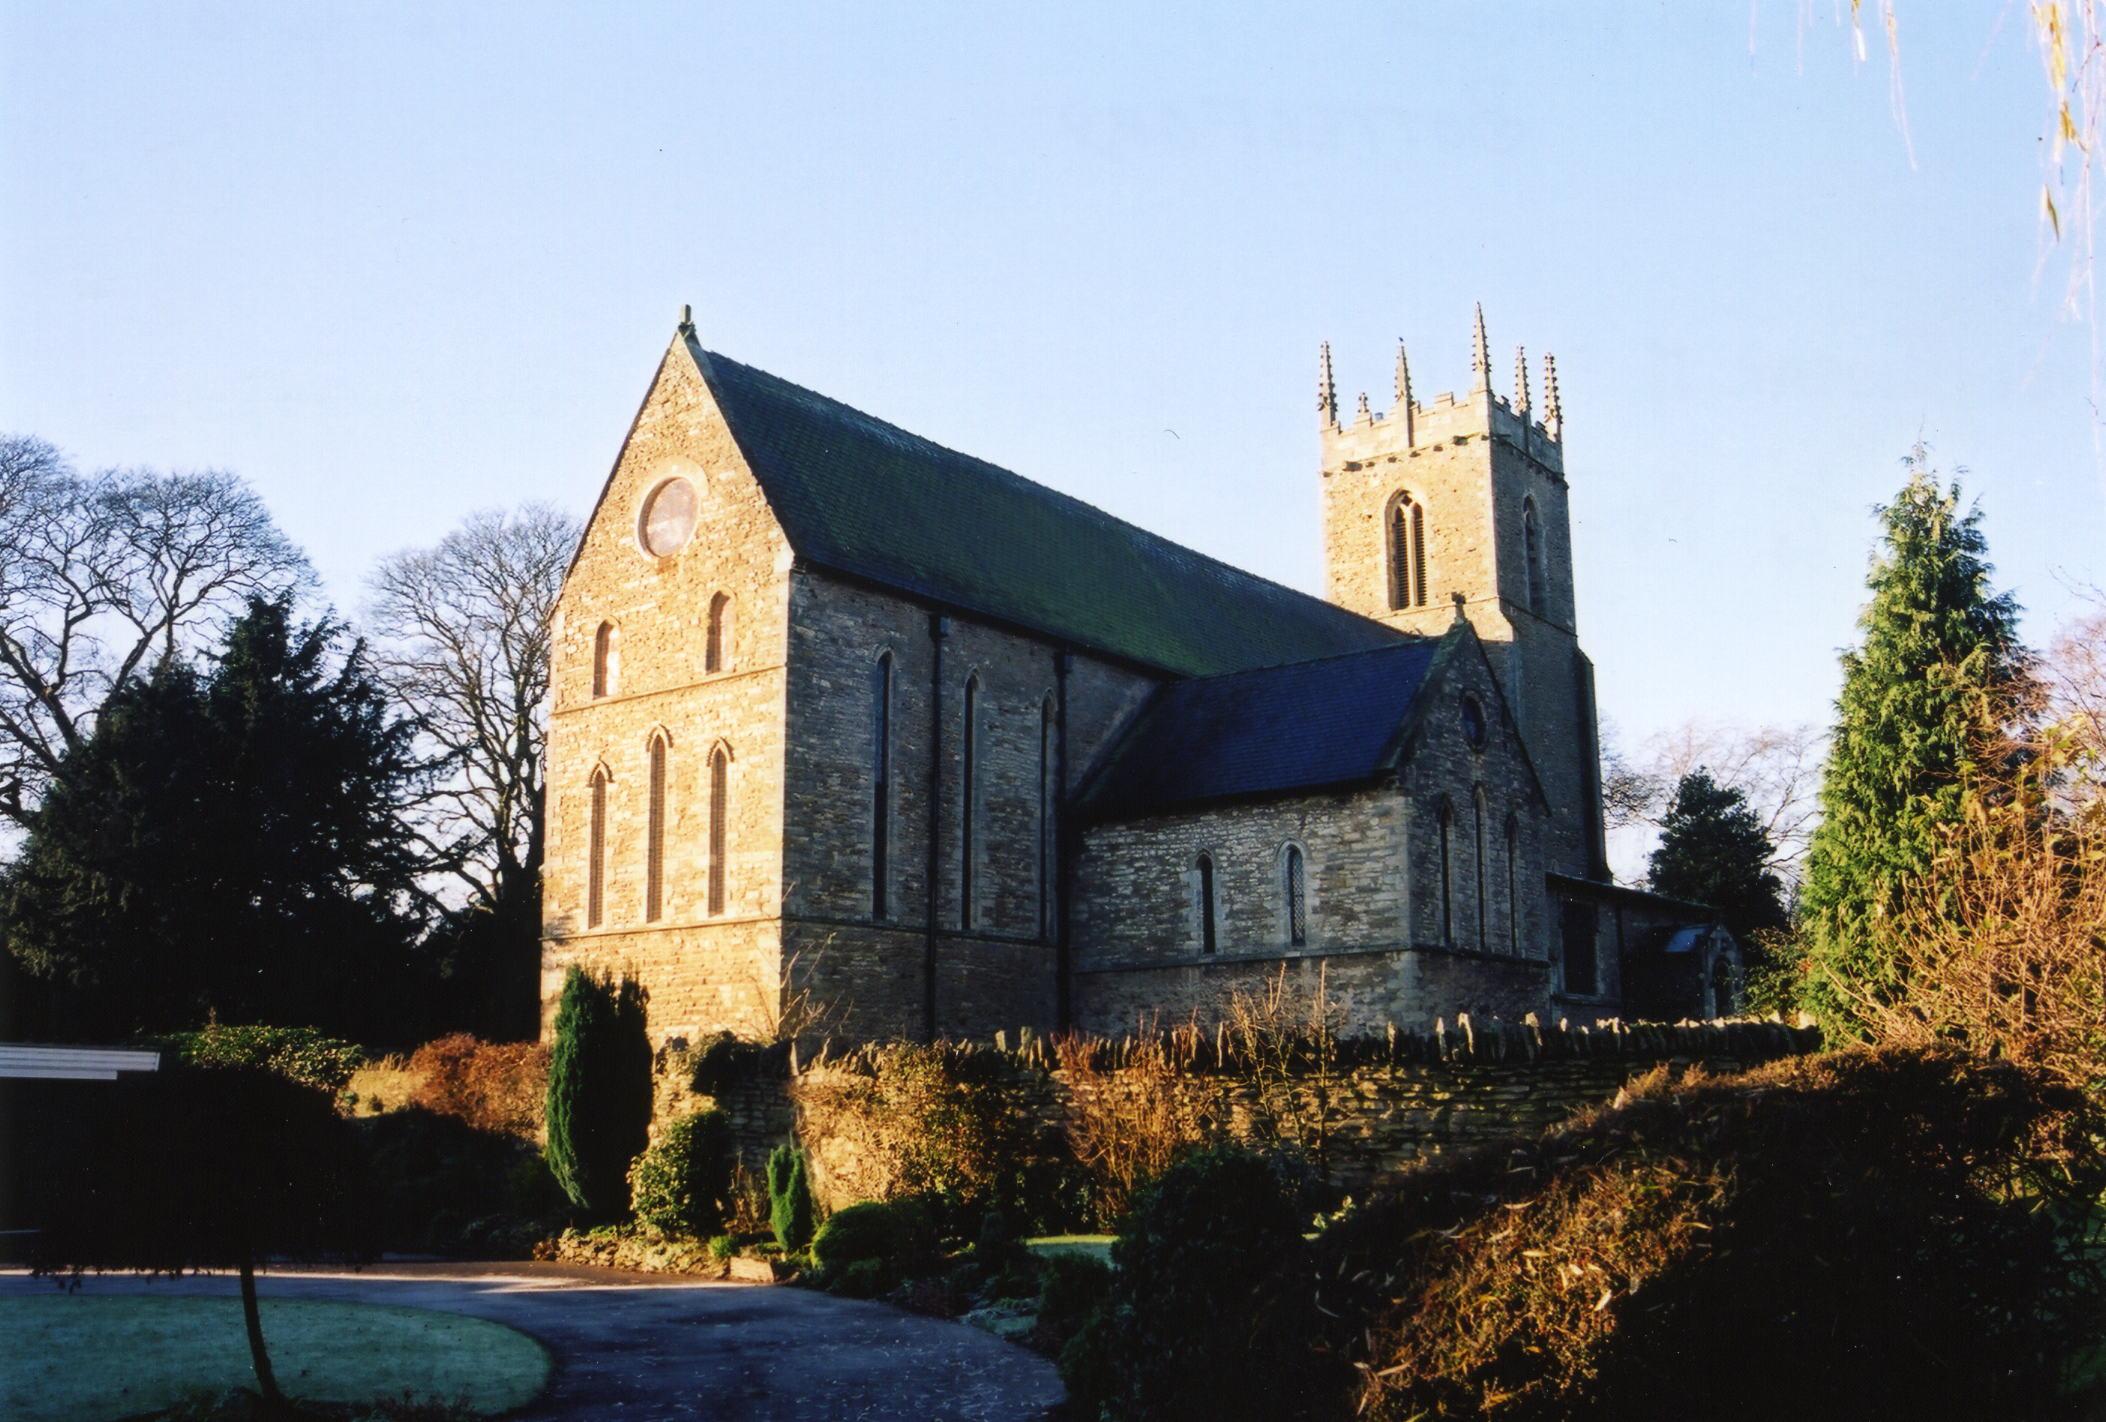 Bottesford St. Peter parish church